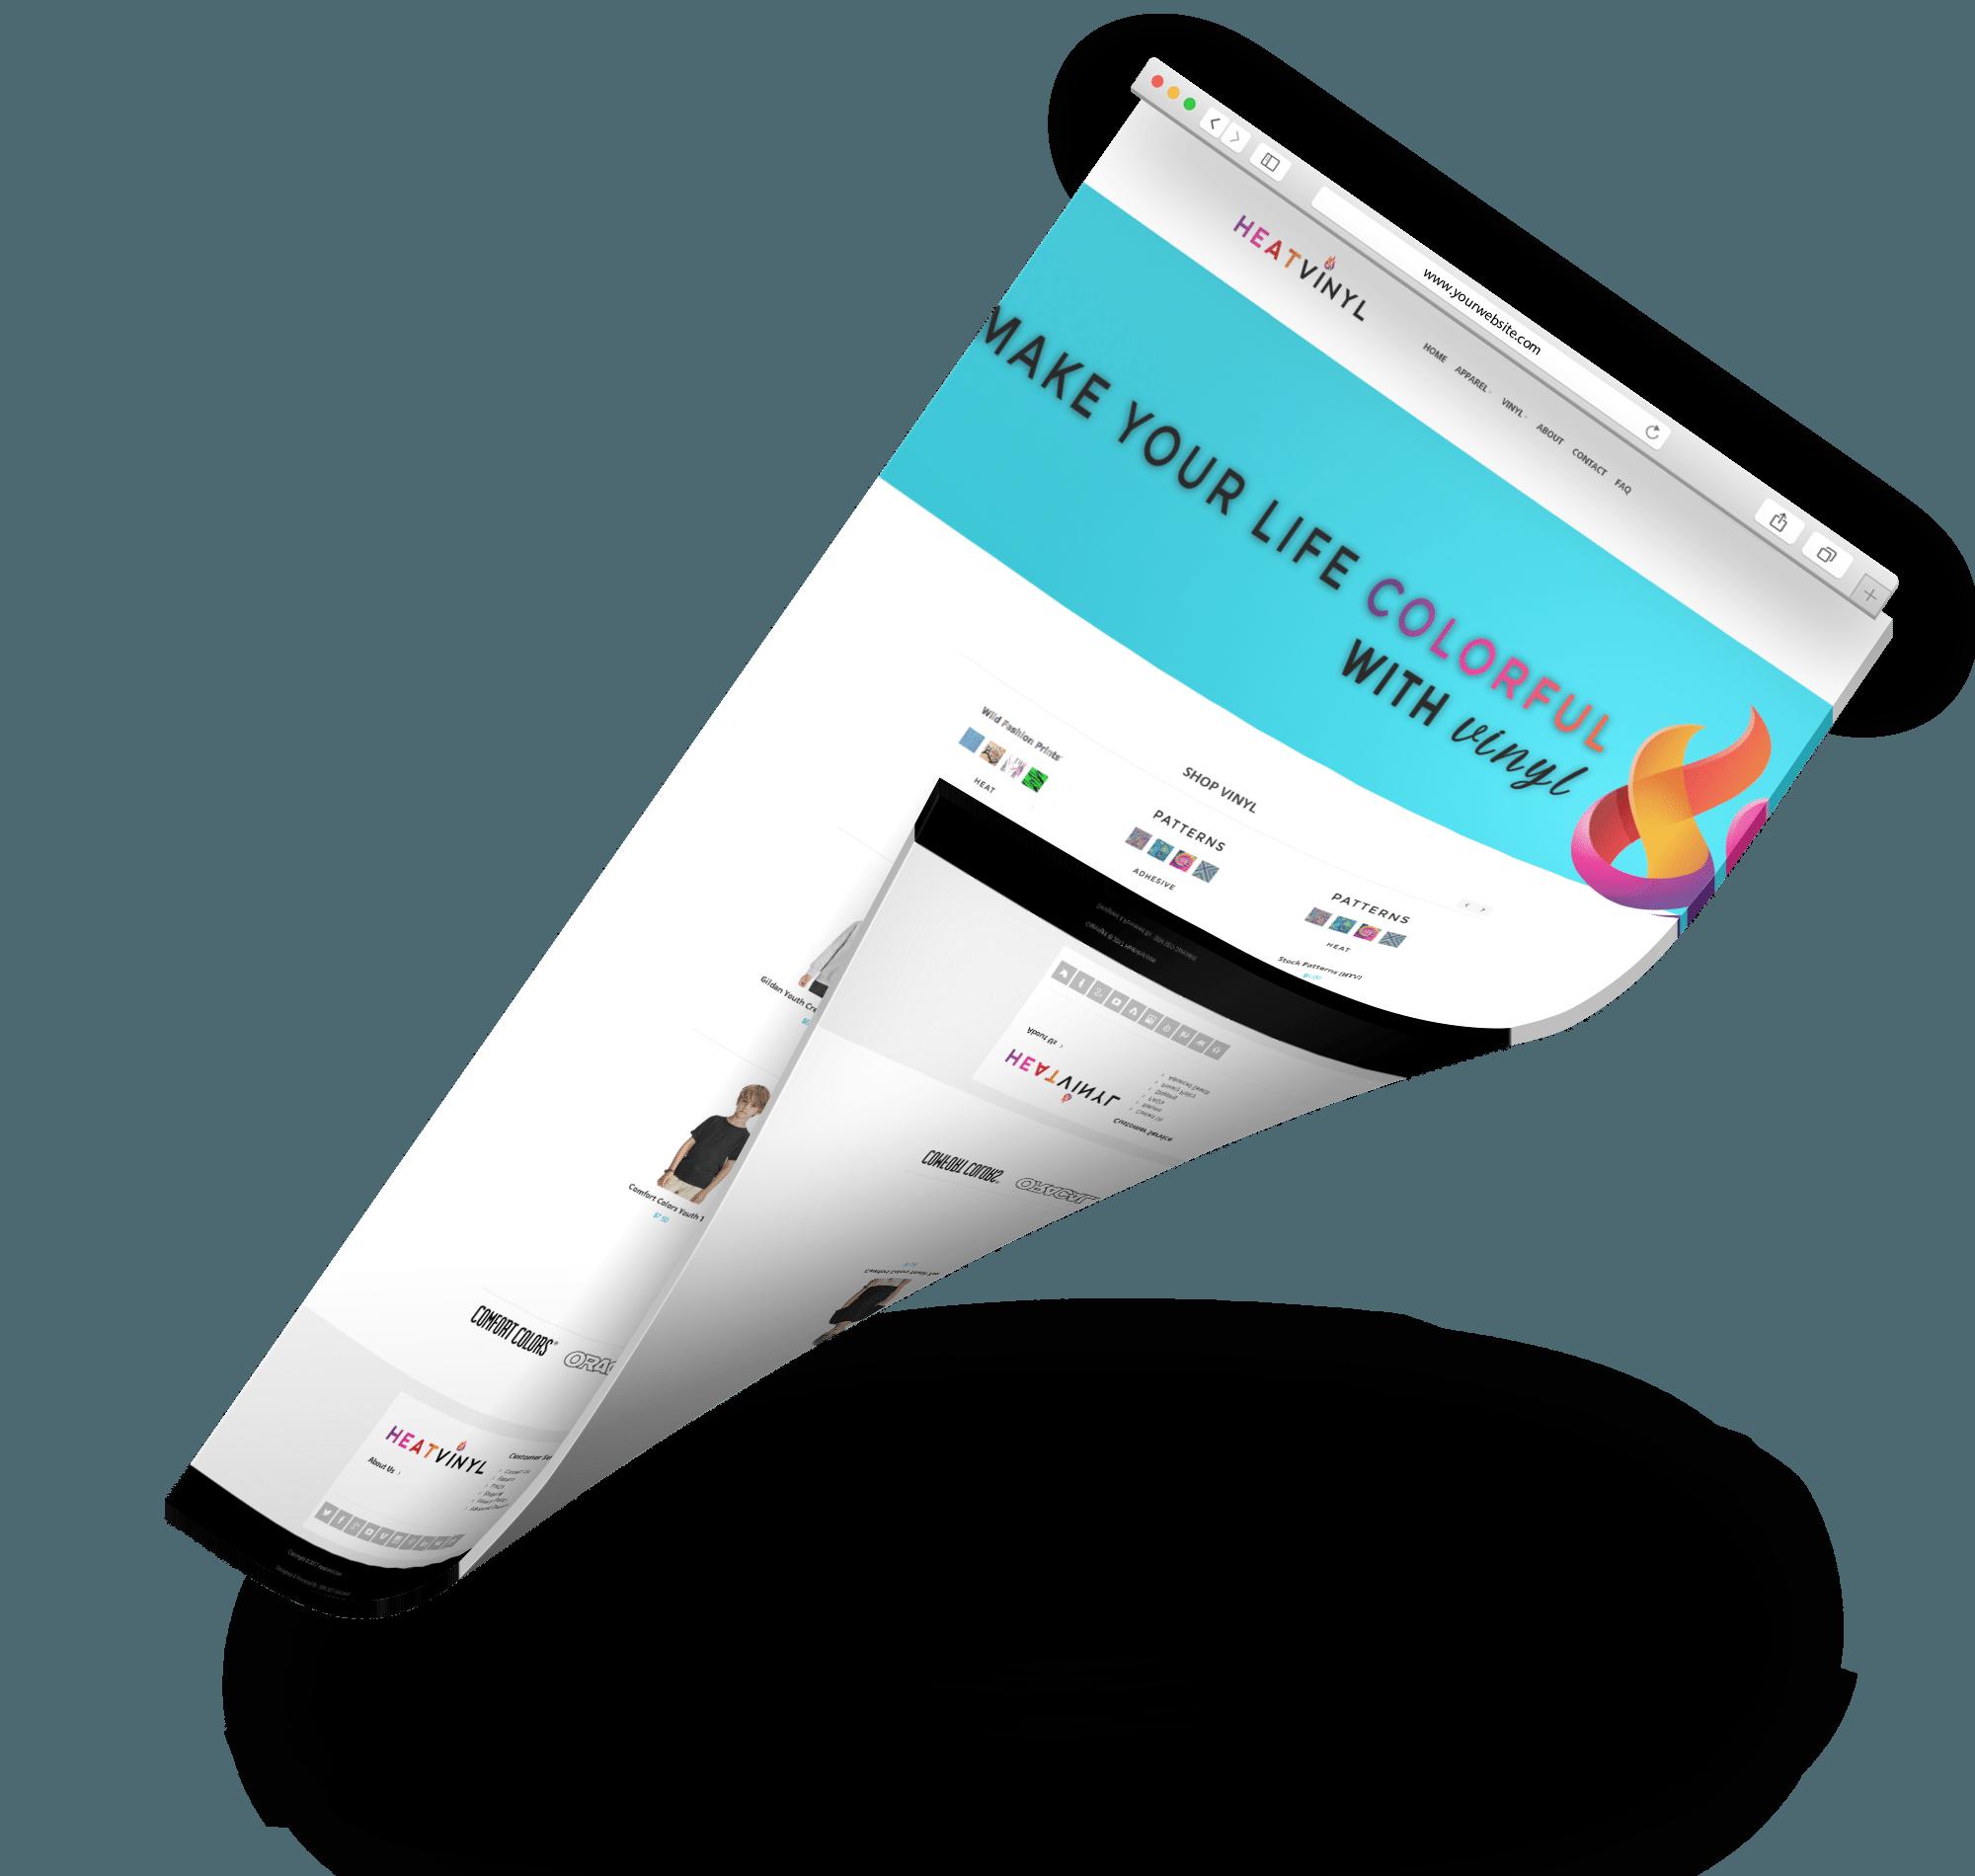 Heat vinyl web design sem seo specialist